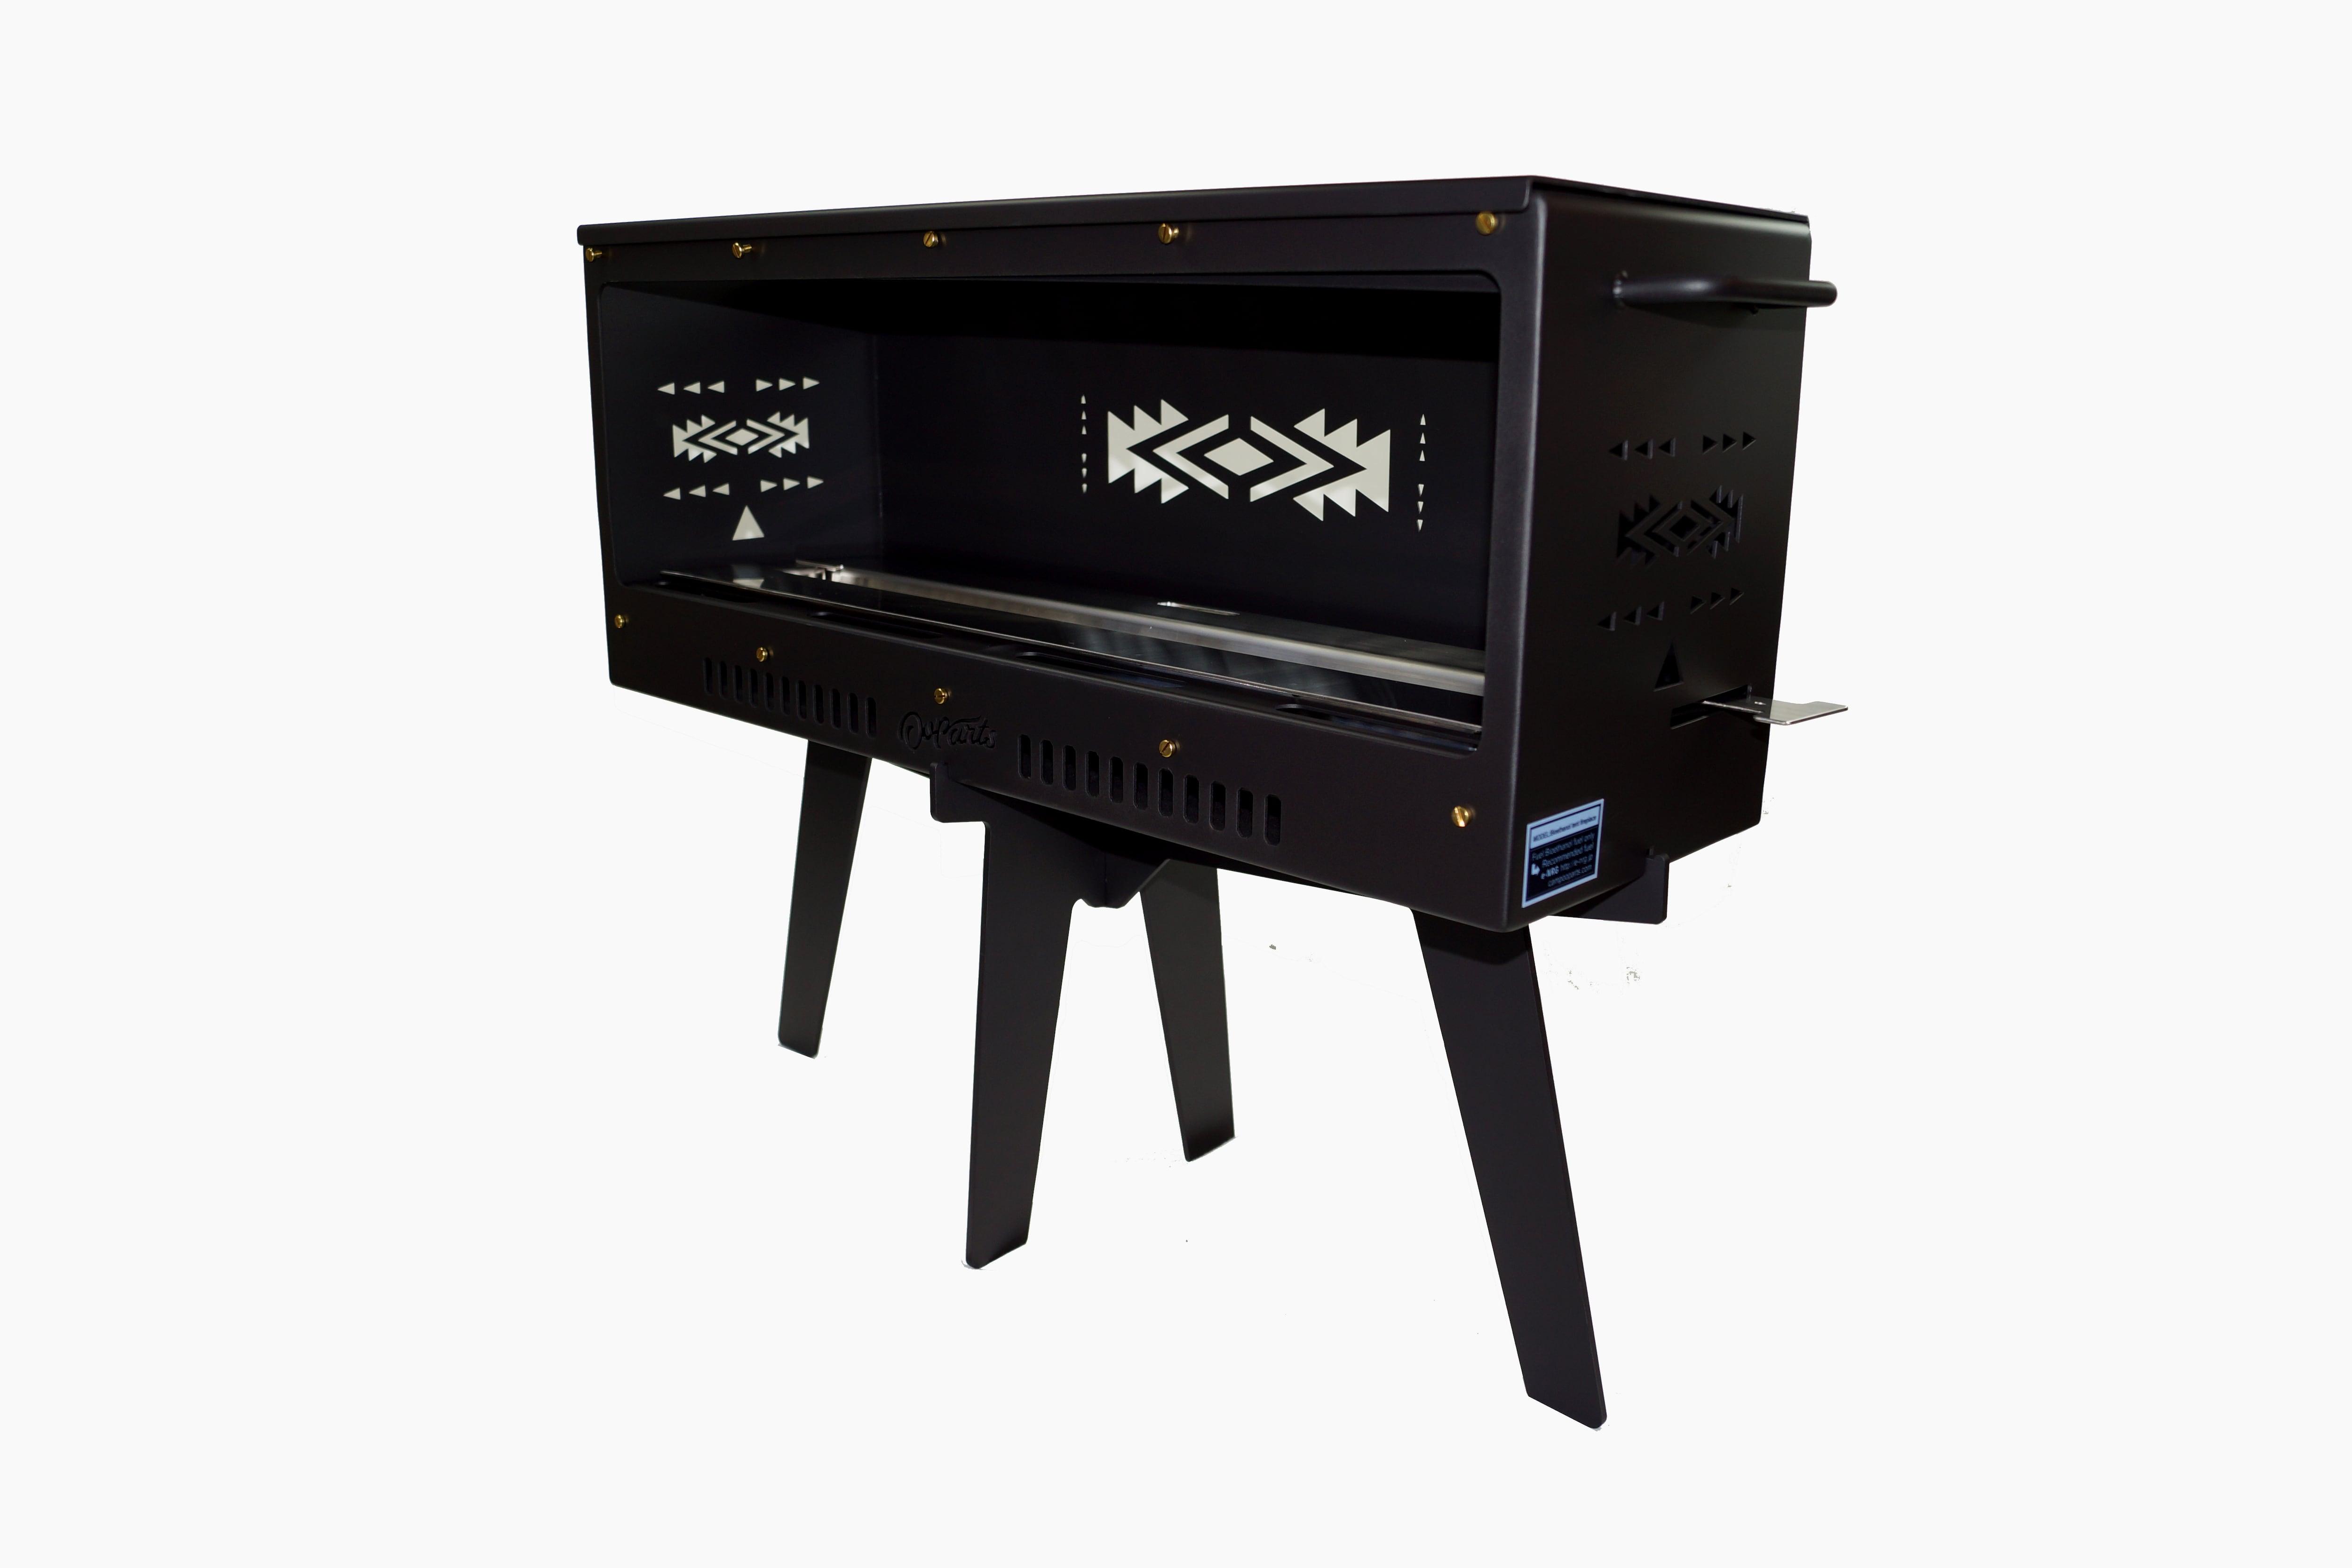 TENTO暖炉【片面ガラス仕様】CPD2・煙突が要らない暖炉?テントの中で安全に使えるキャンプ用暖炉バイオエタノール暖炉 CAMPOOPARTS